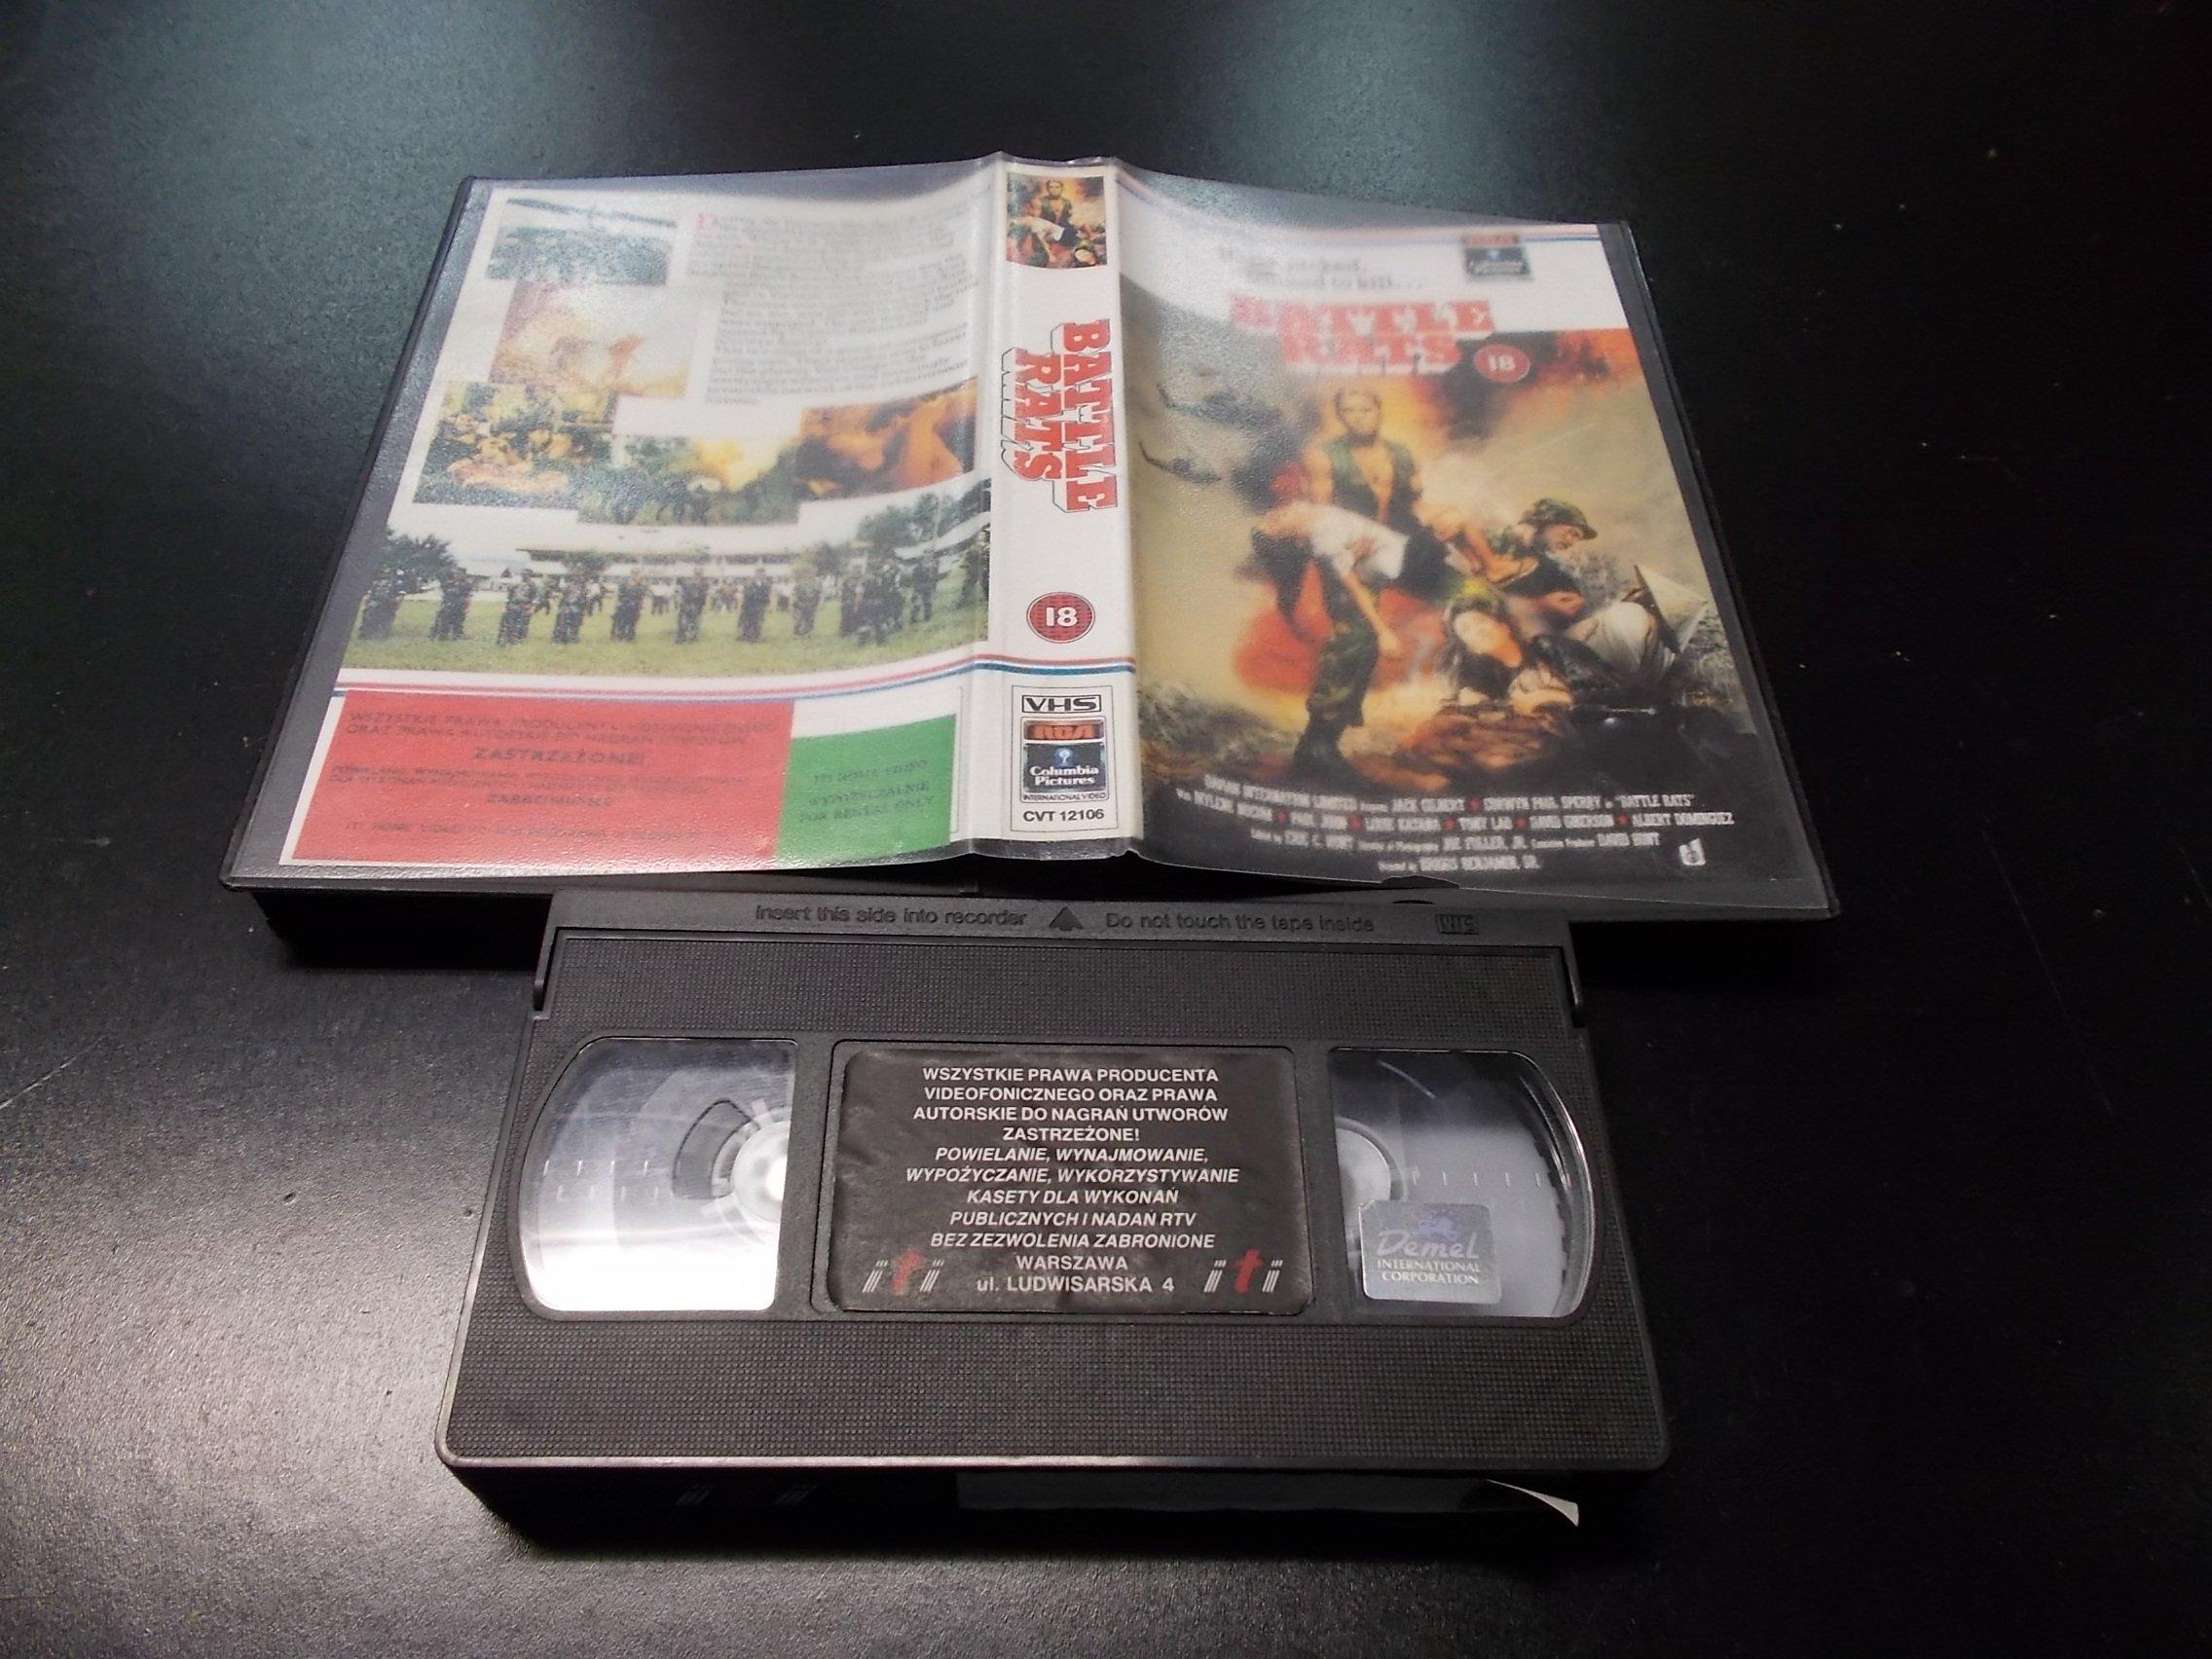 WOJNY SZCZURÓW  -  kaseta Video VHS - 1306 Opole - AlleOpole.pl